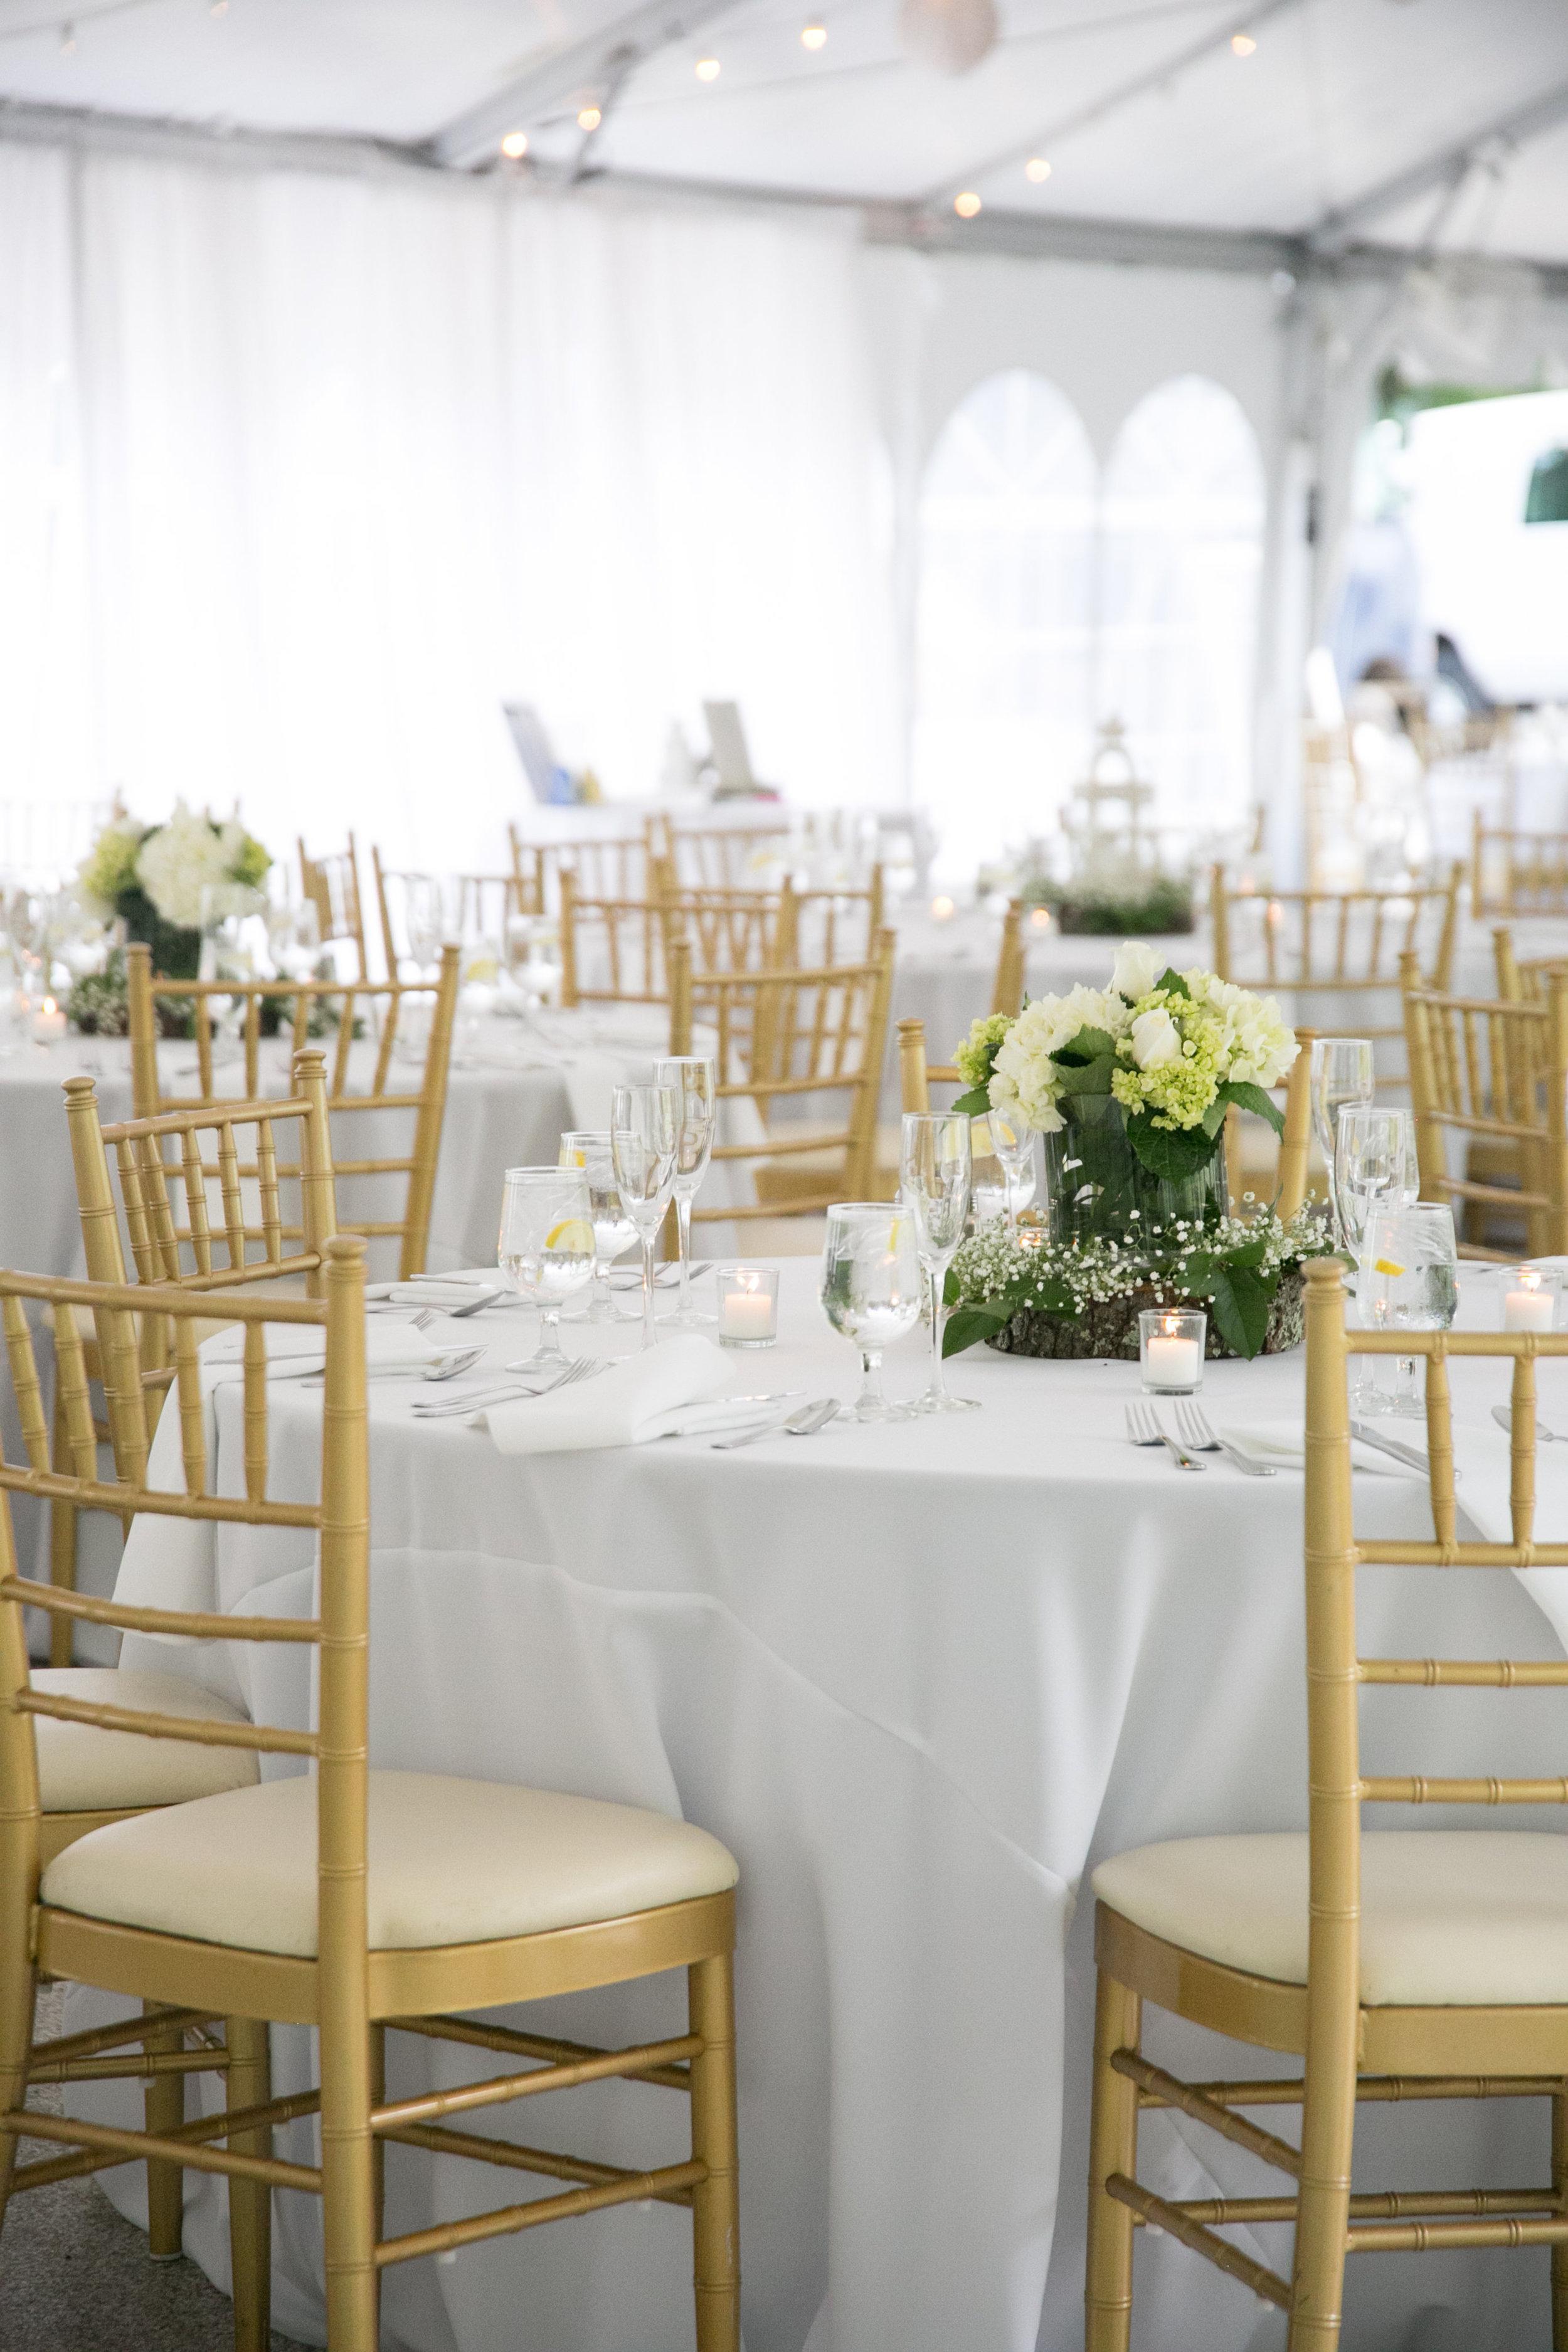 Pure elegance events Tynise Kee dc wedding planner va wedding planner rust manor house leesburg -0048.jpg